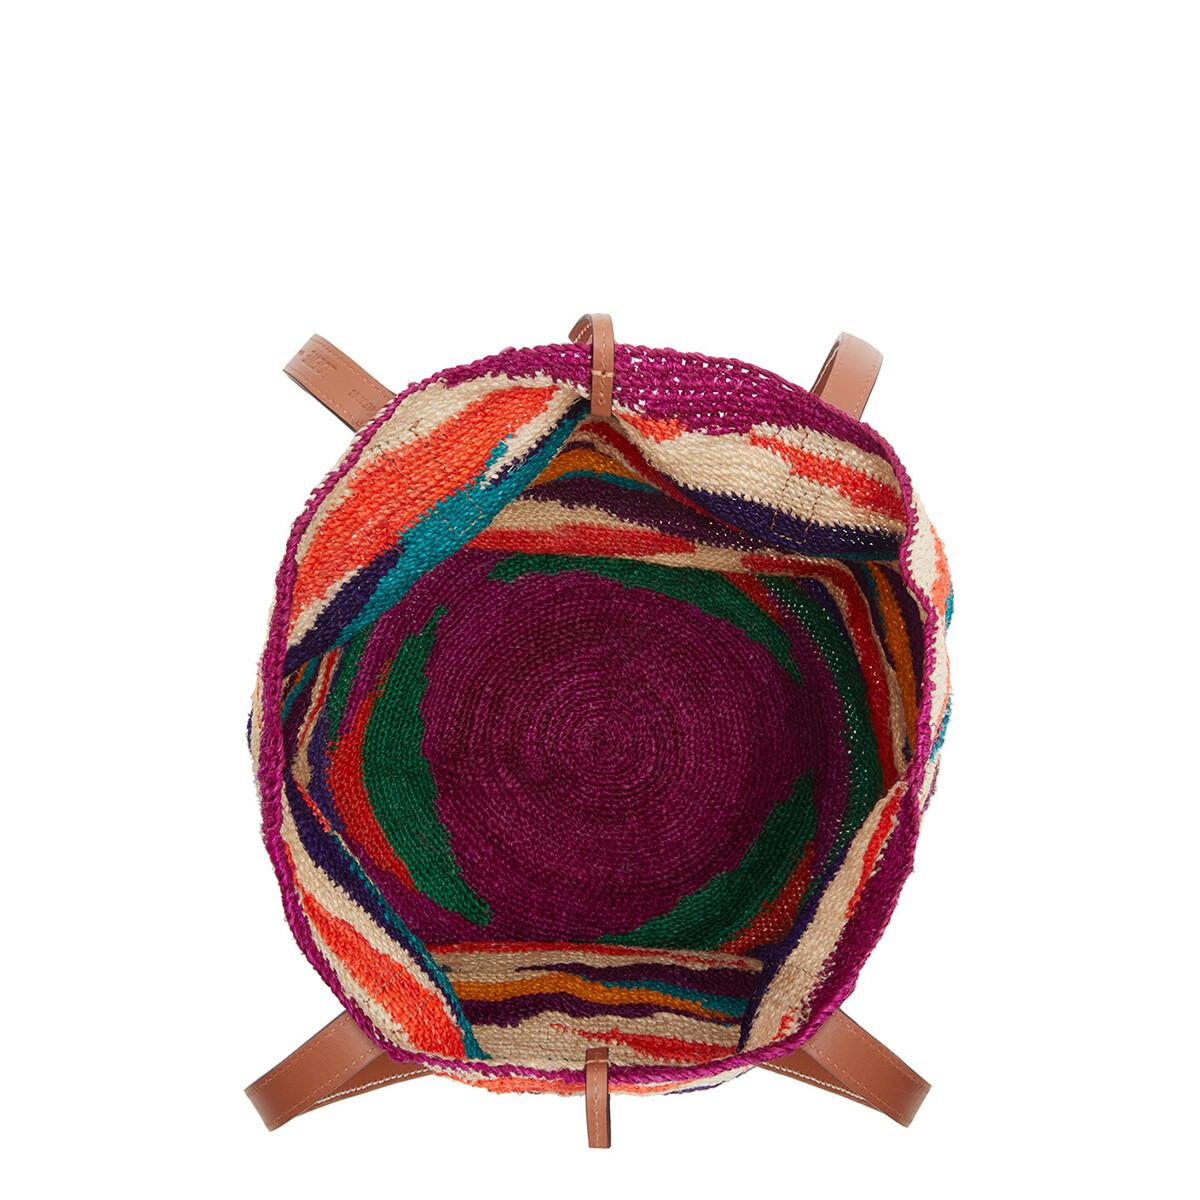 LOEWE Shigra Basket Bag In Agave And Calfskin Multicolor/Pecan front